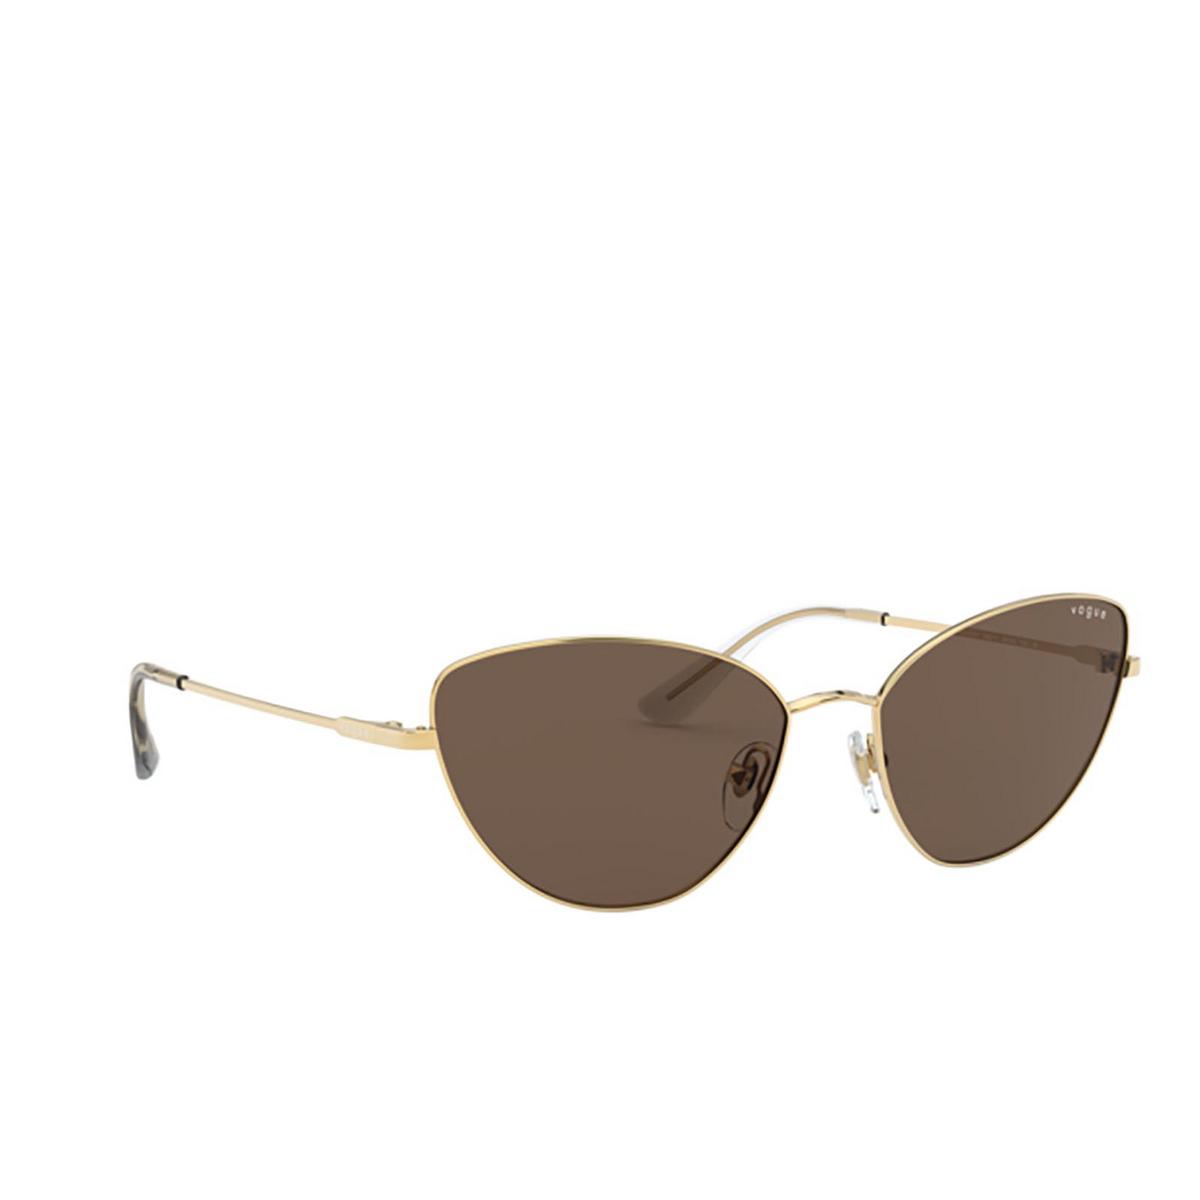 Vogue® Cat-eye Sunglasses: VO4179S color Gold 280/73 - three-quarters view.